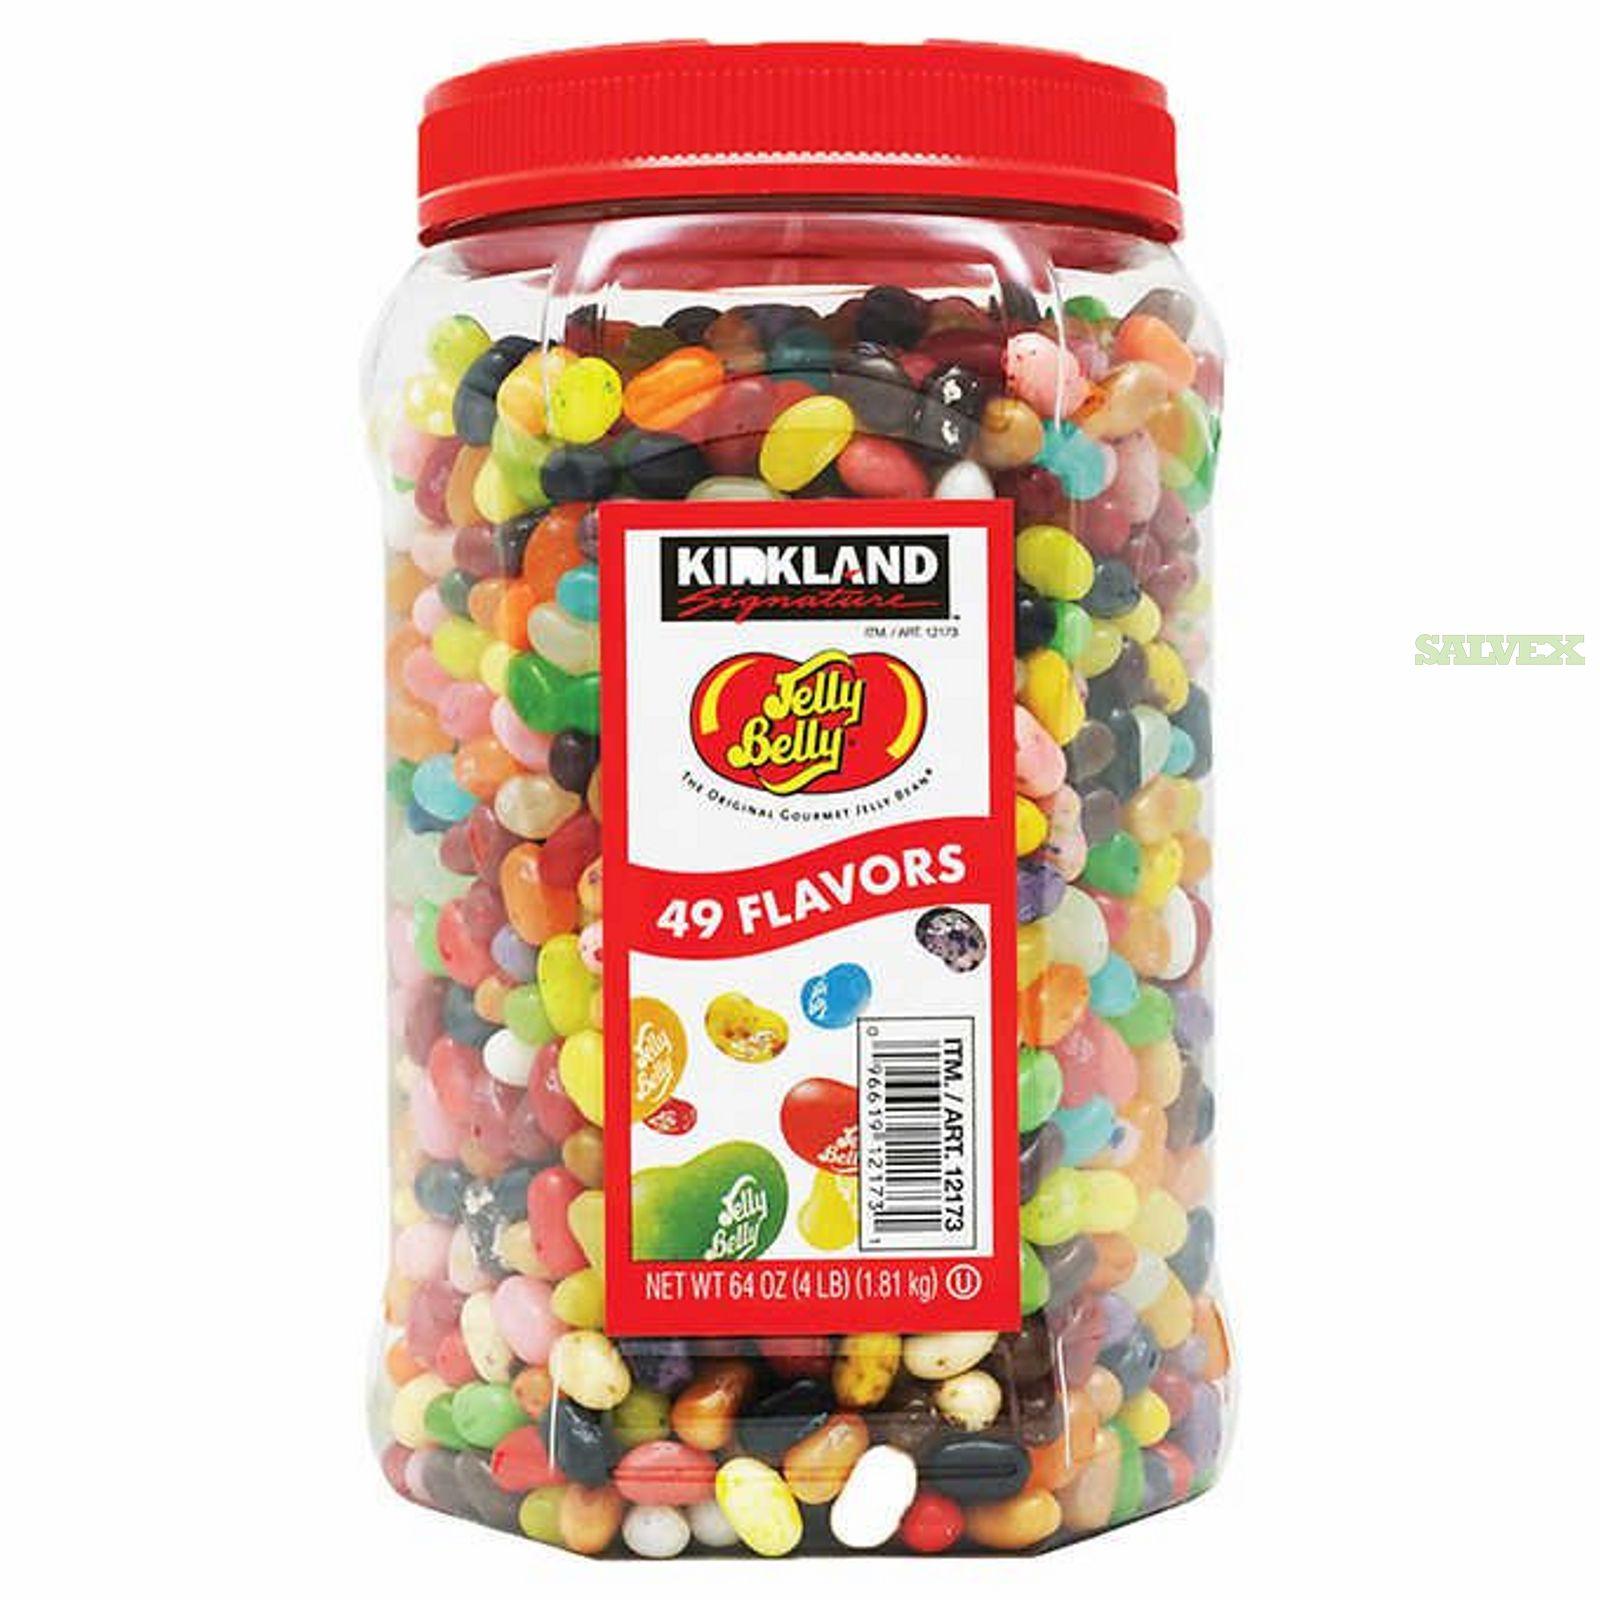 Kirkland Signature Jelly Belly Beans (77 Units)